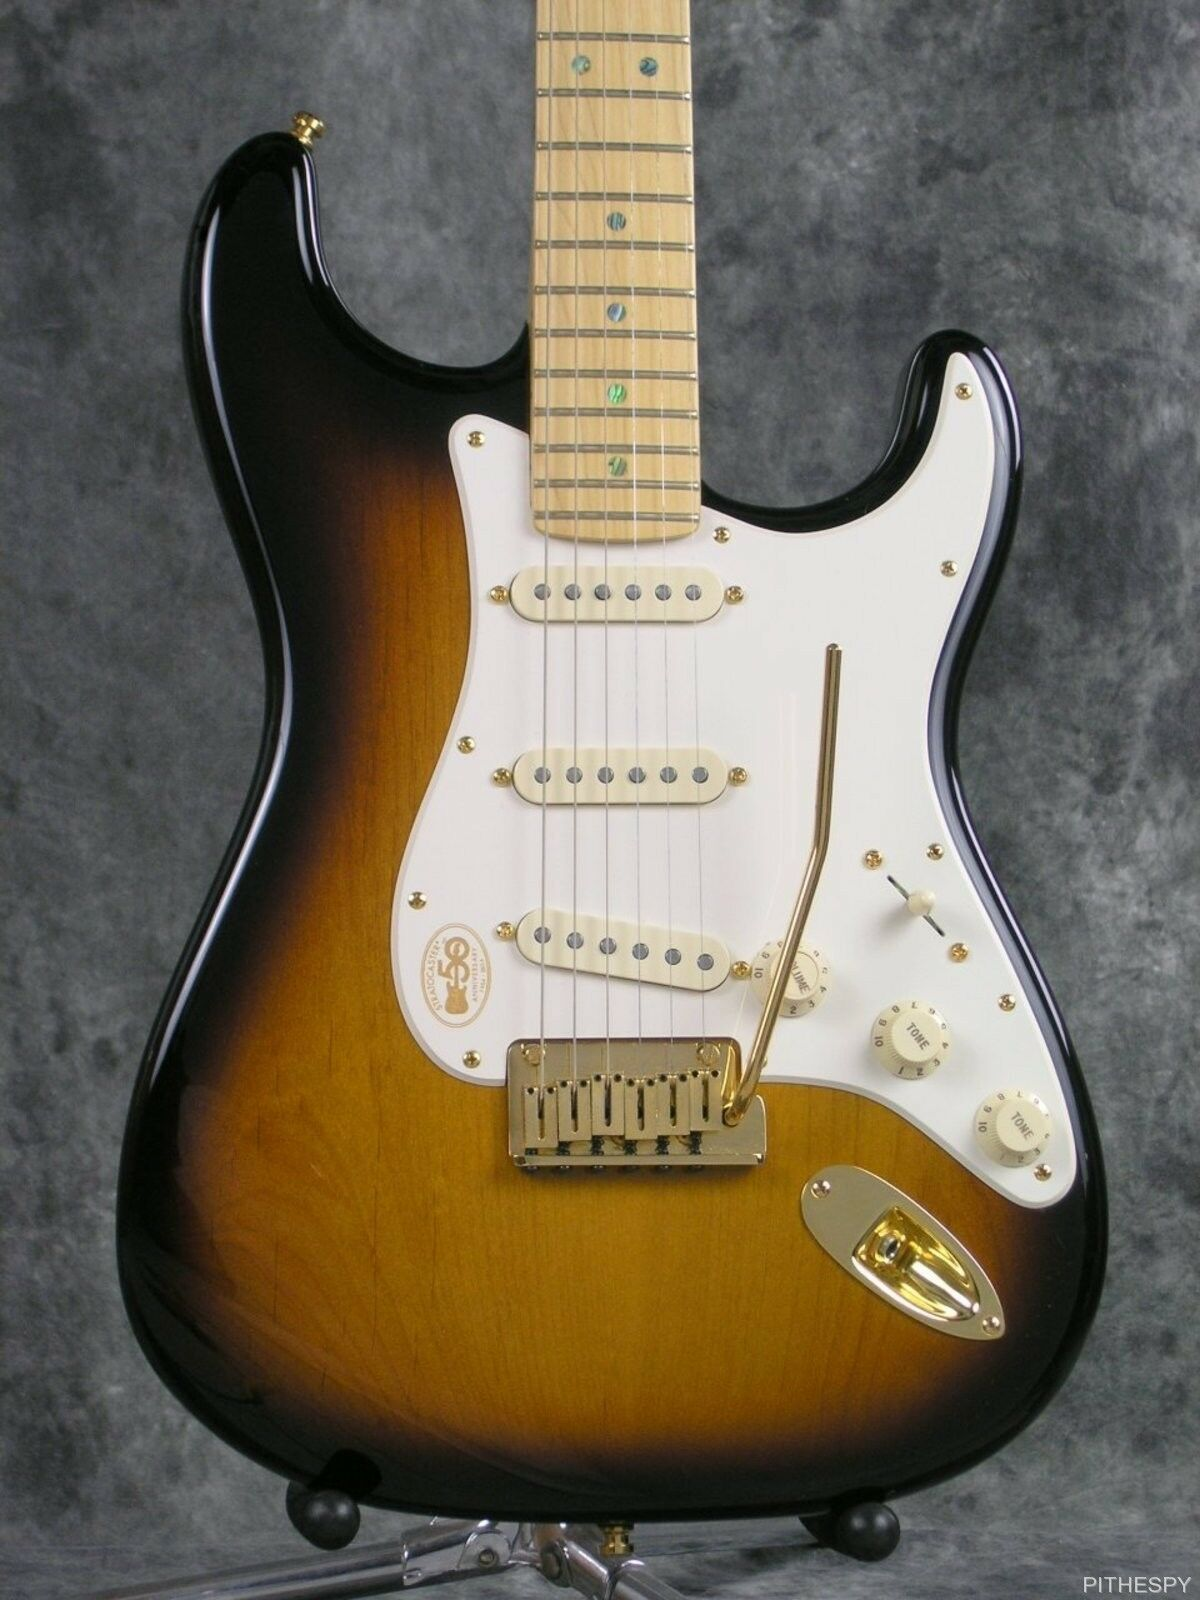 1996 50th anniversary fender stratocaster value